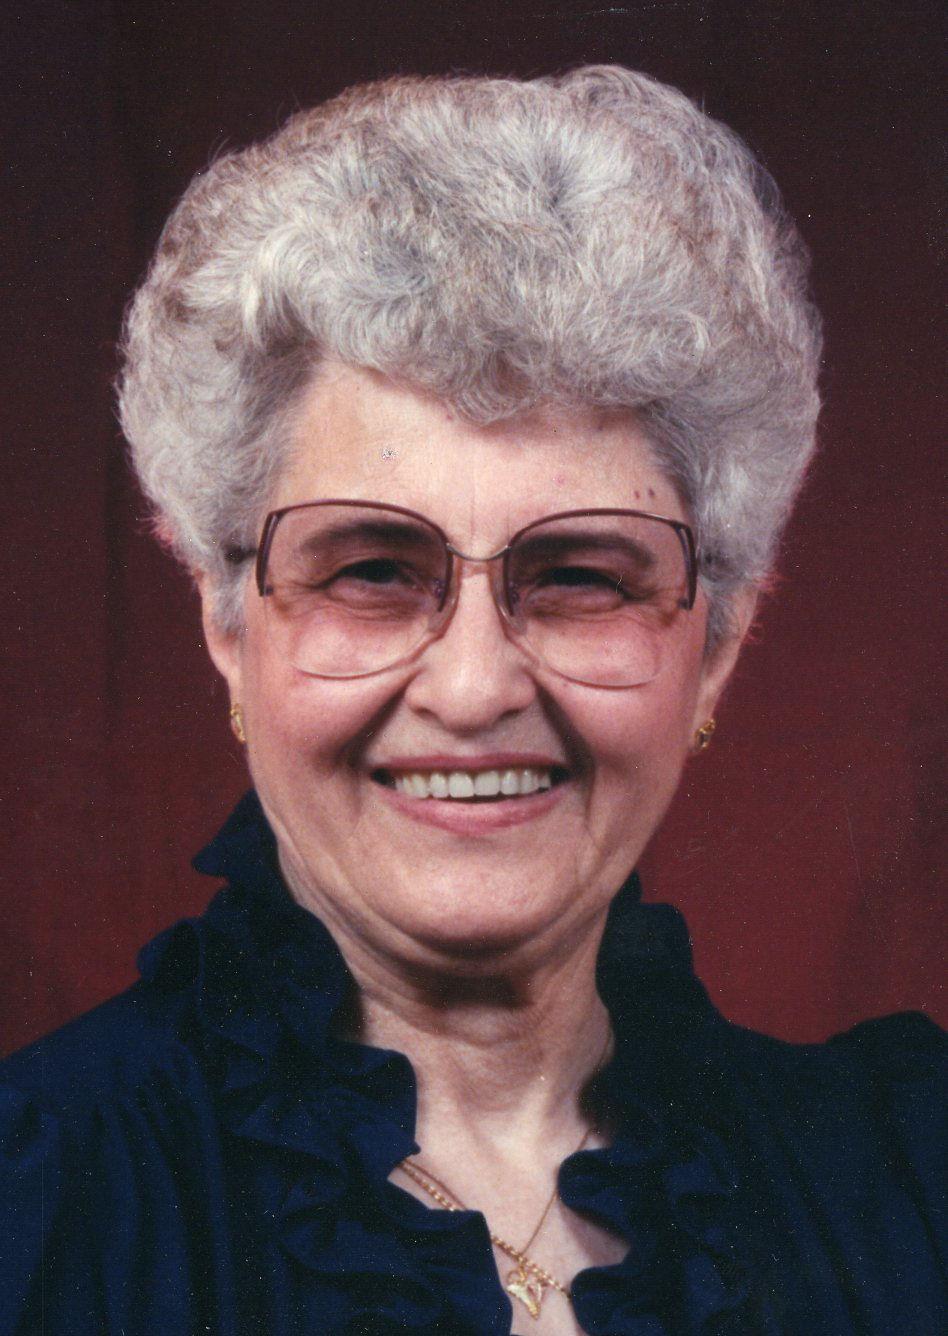 Liana Del Balzo (1899?982 (born in Buenos Aires, Argentina) forecast